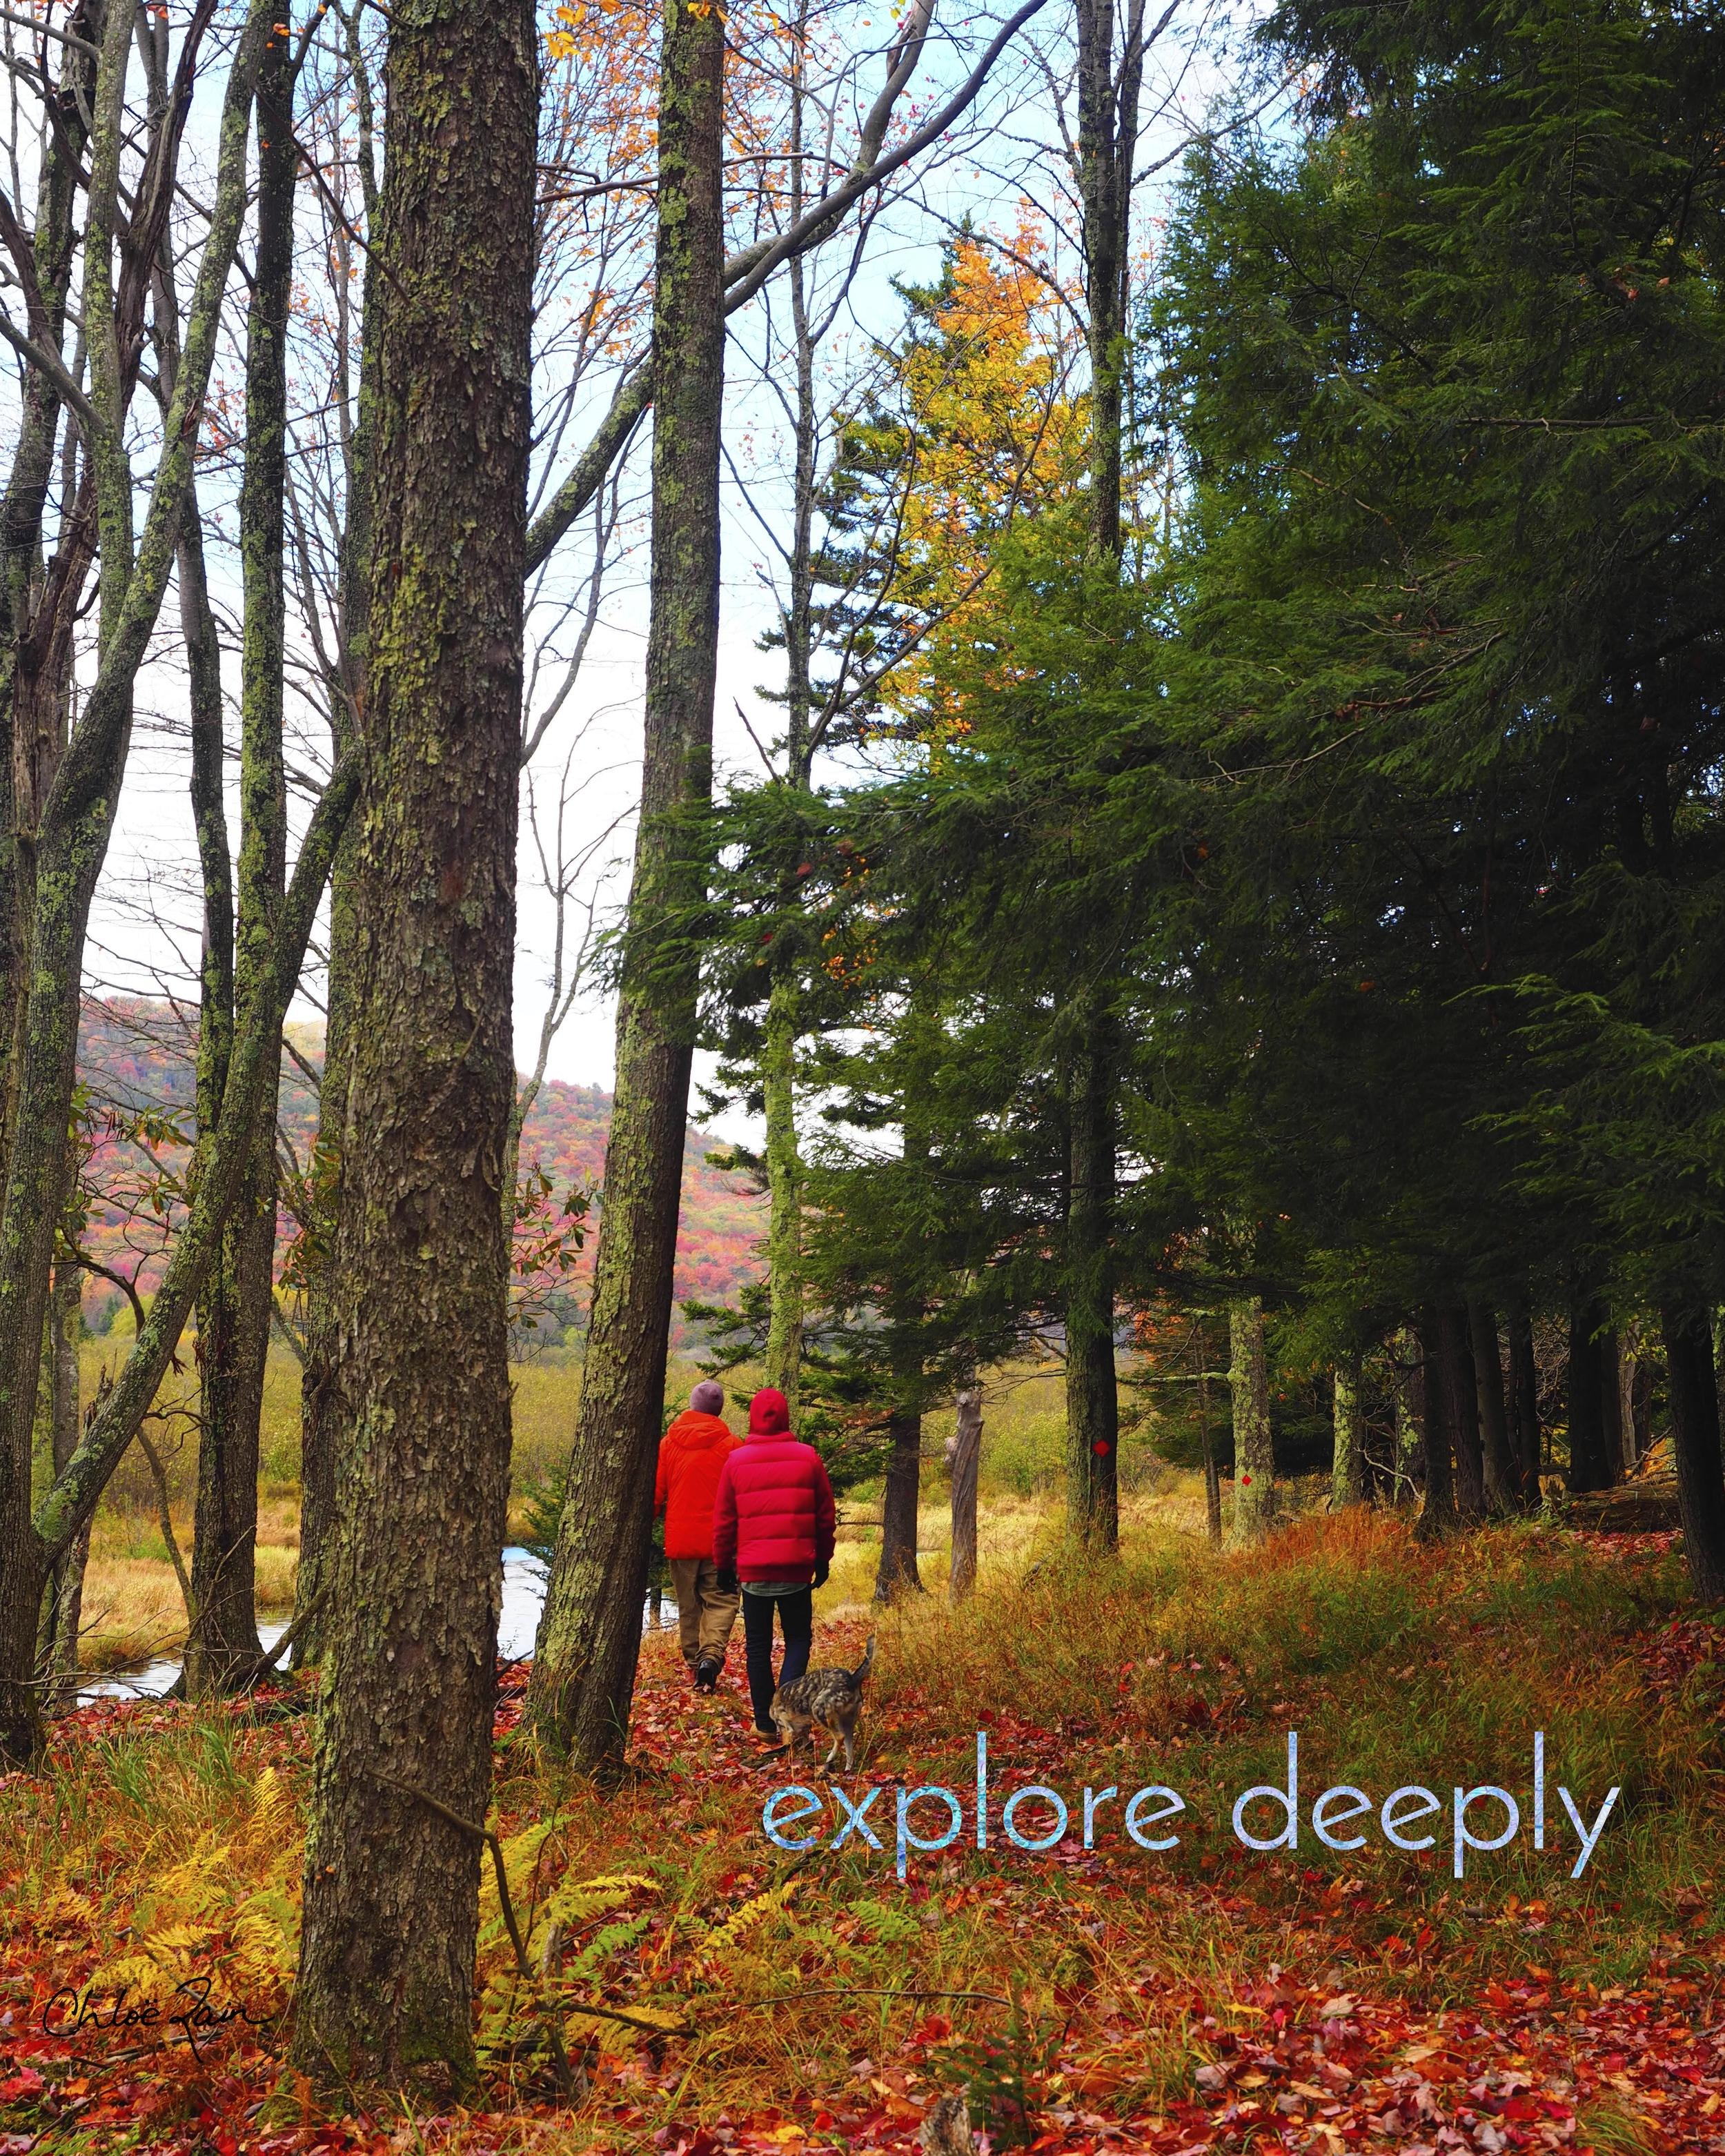 Explore DEEPLY